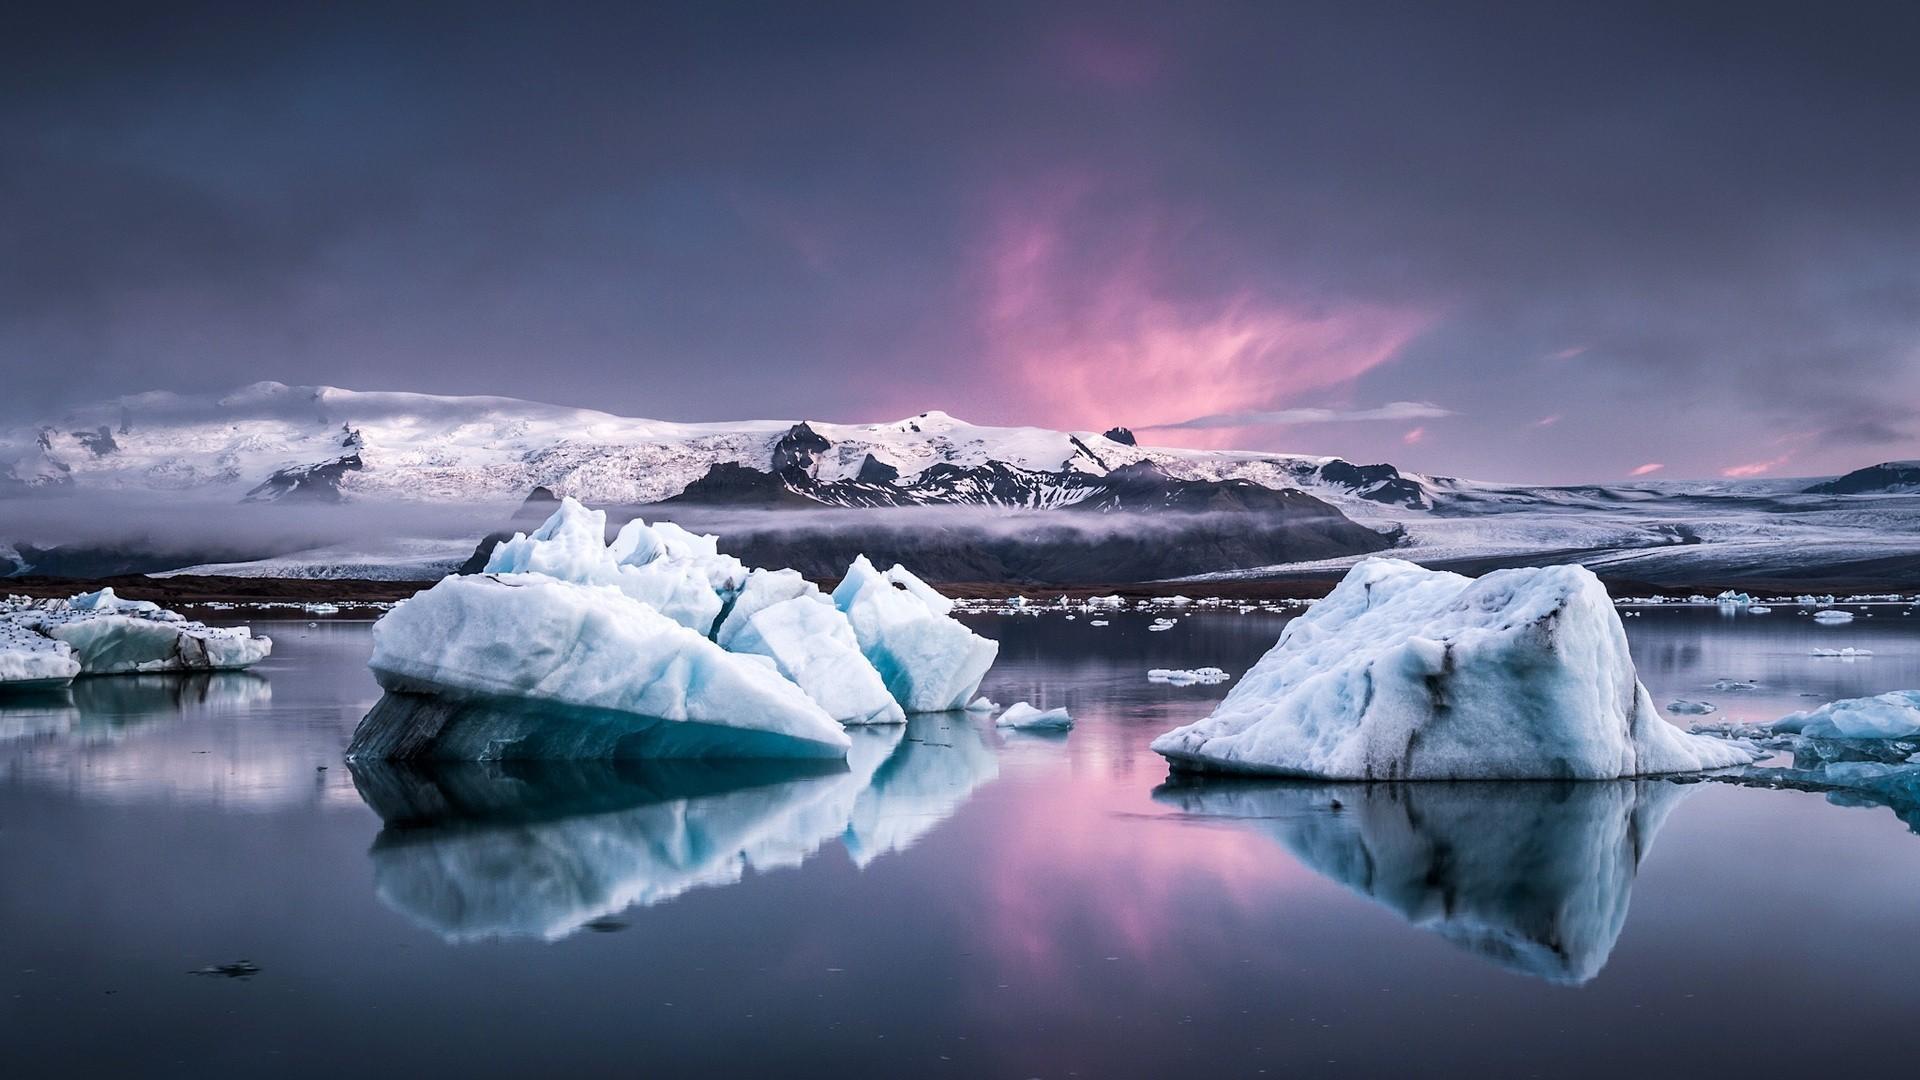 Iceberg Wallpaper theme